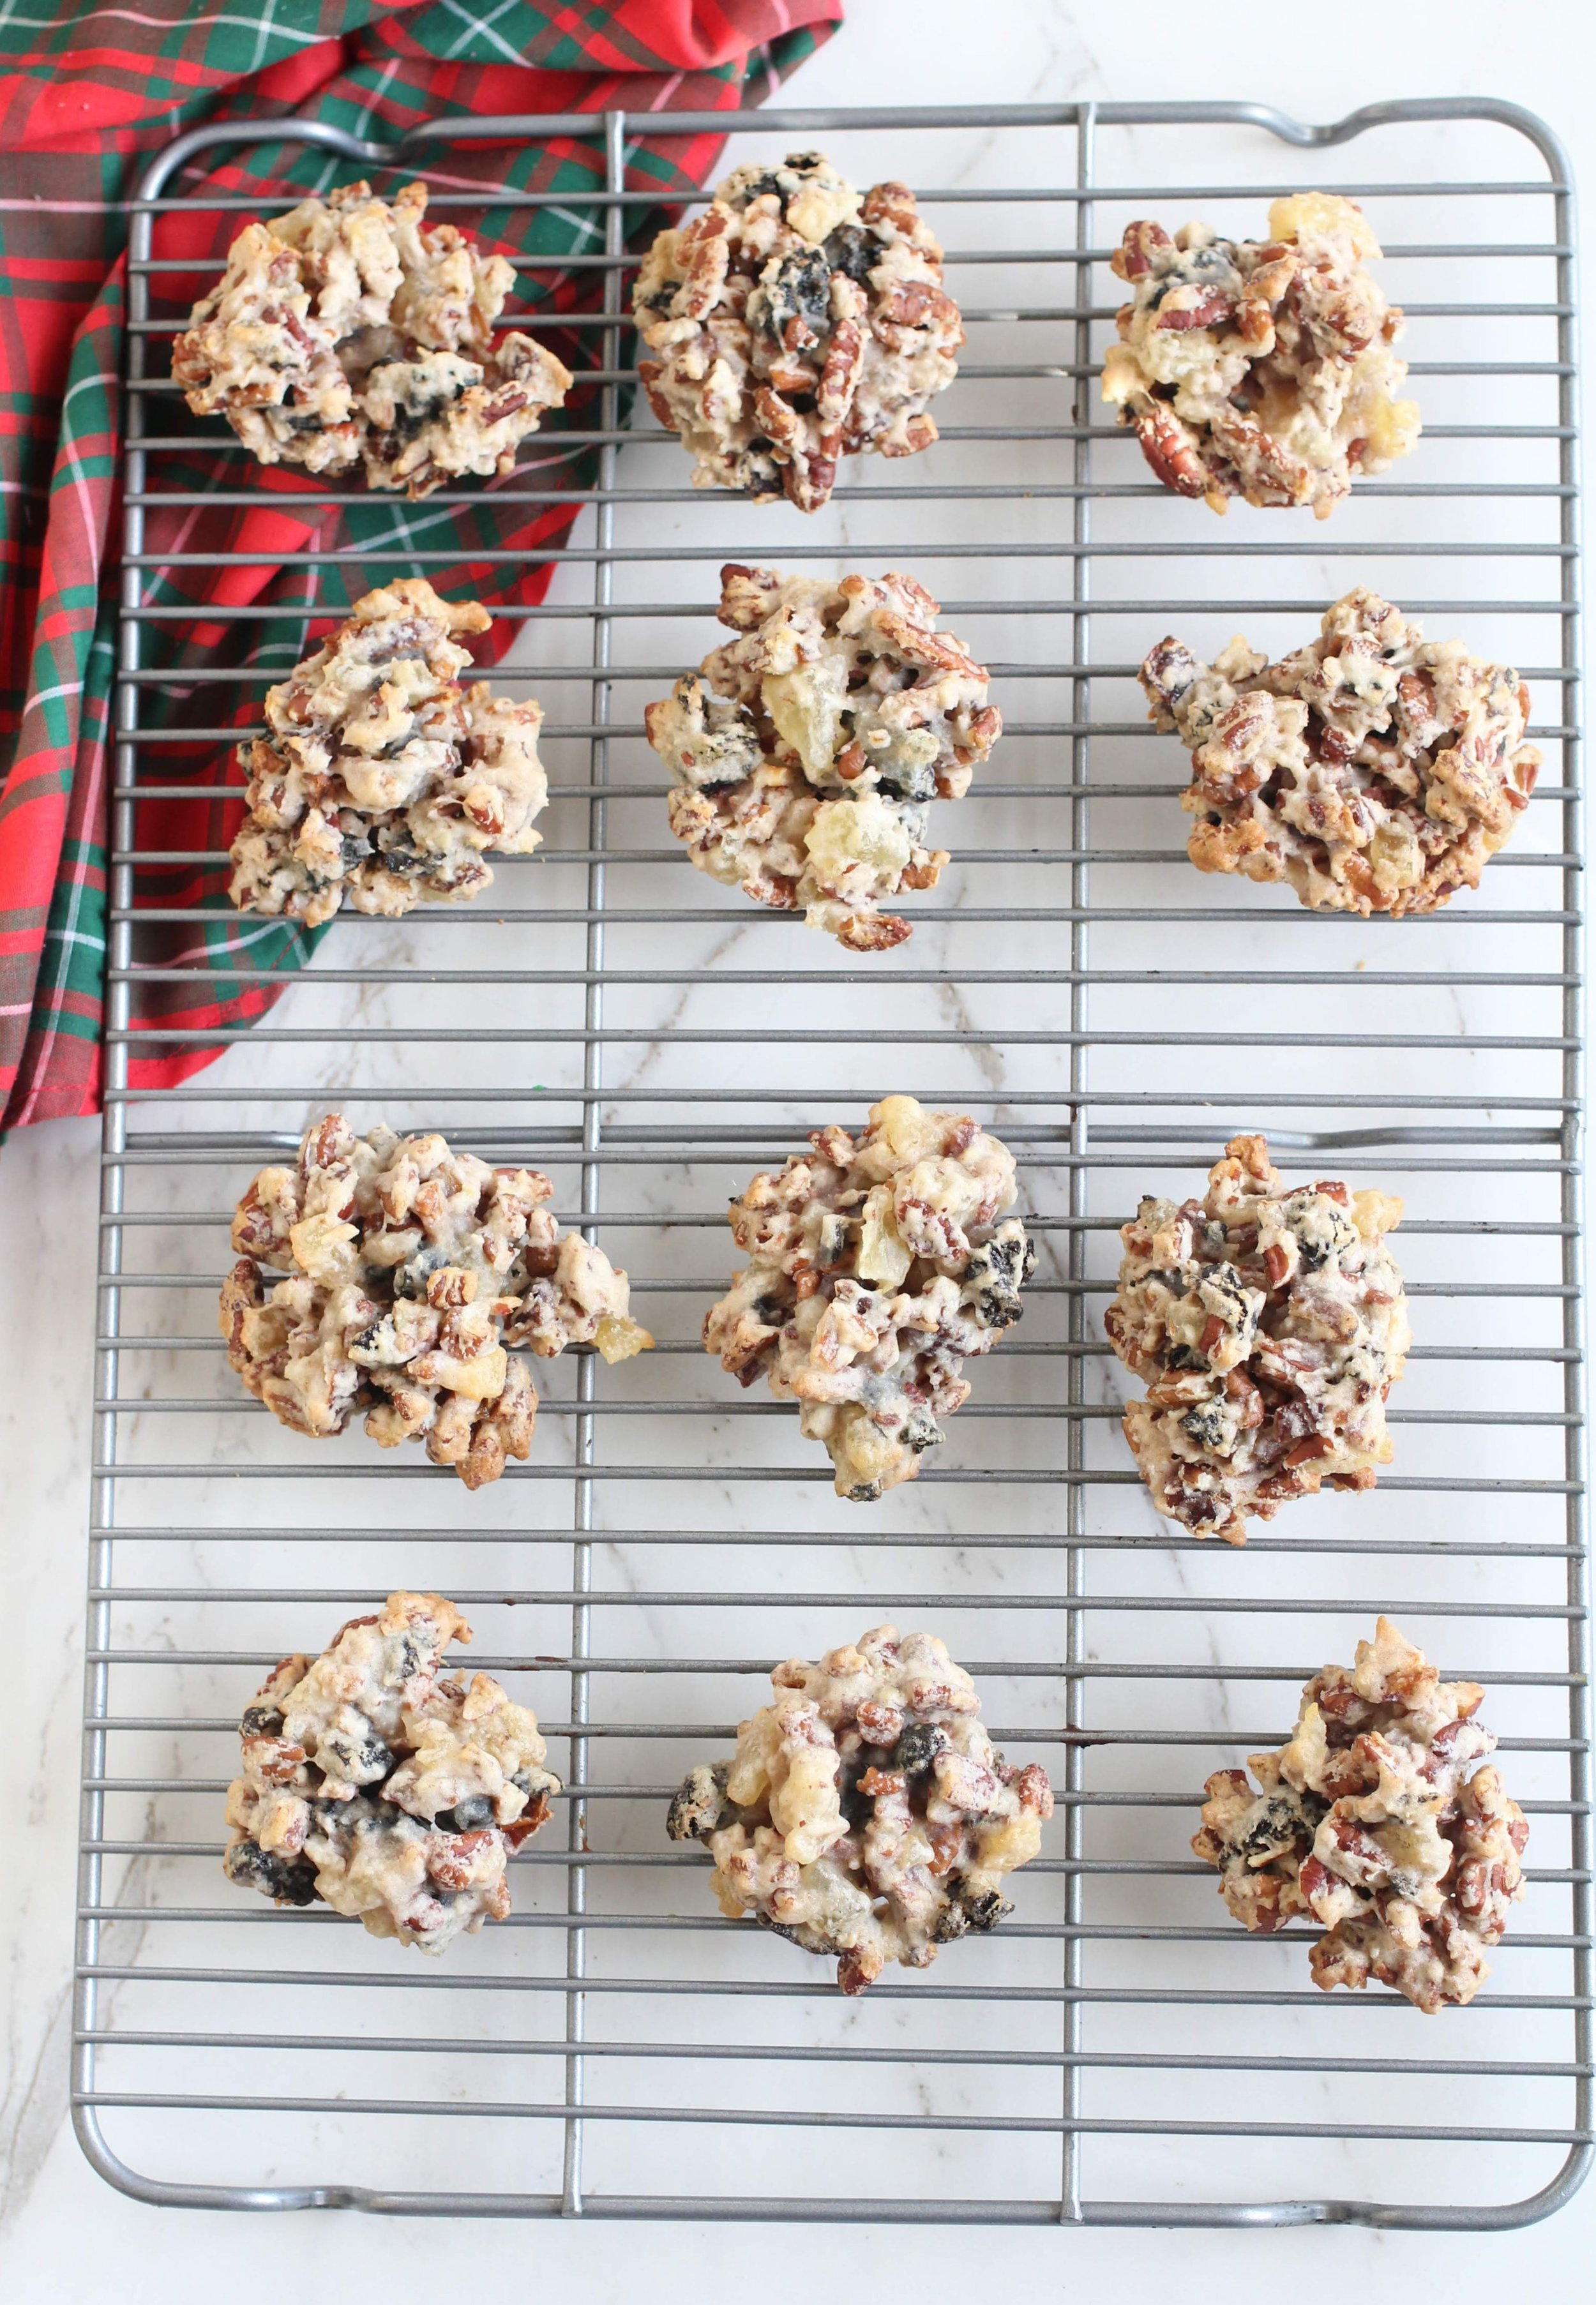 gltuen free and dairy free cookie recipe